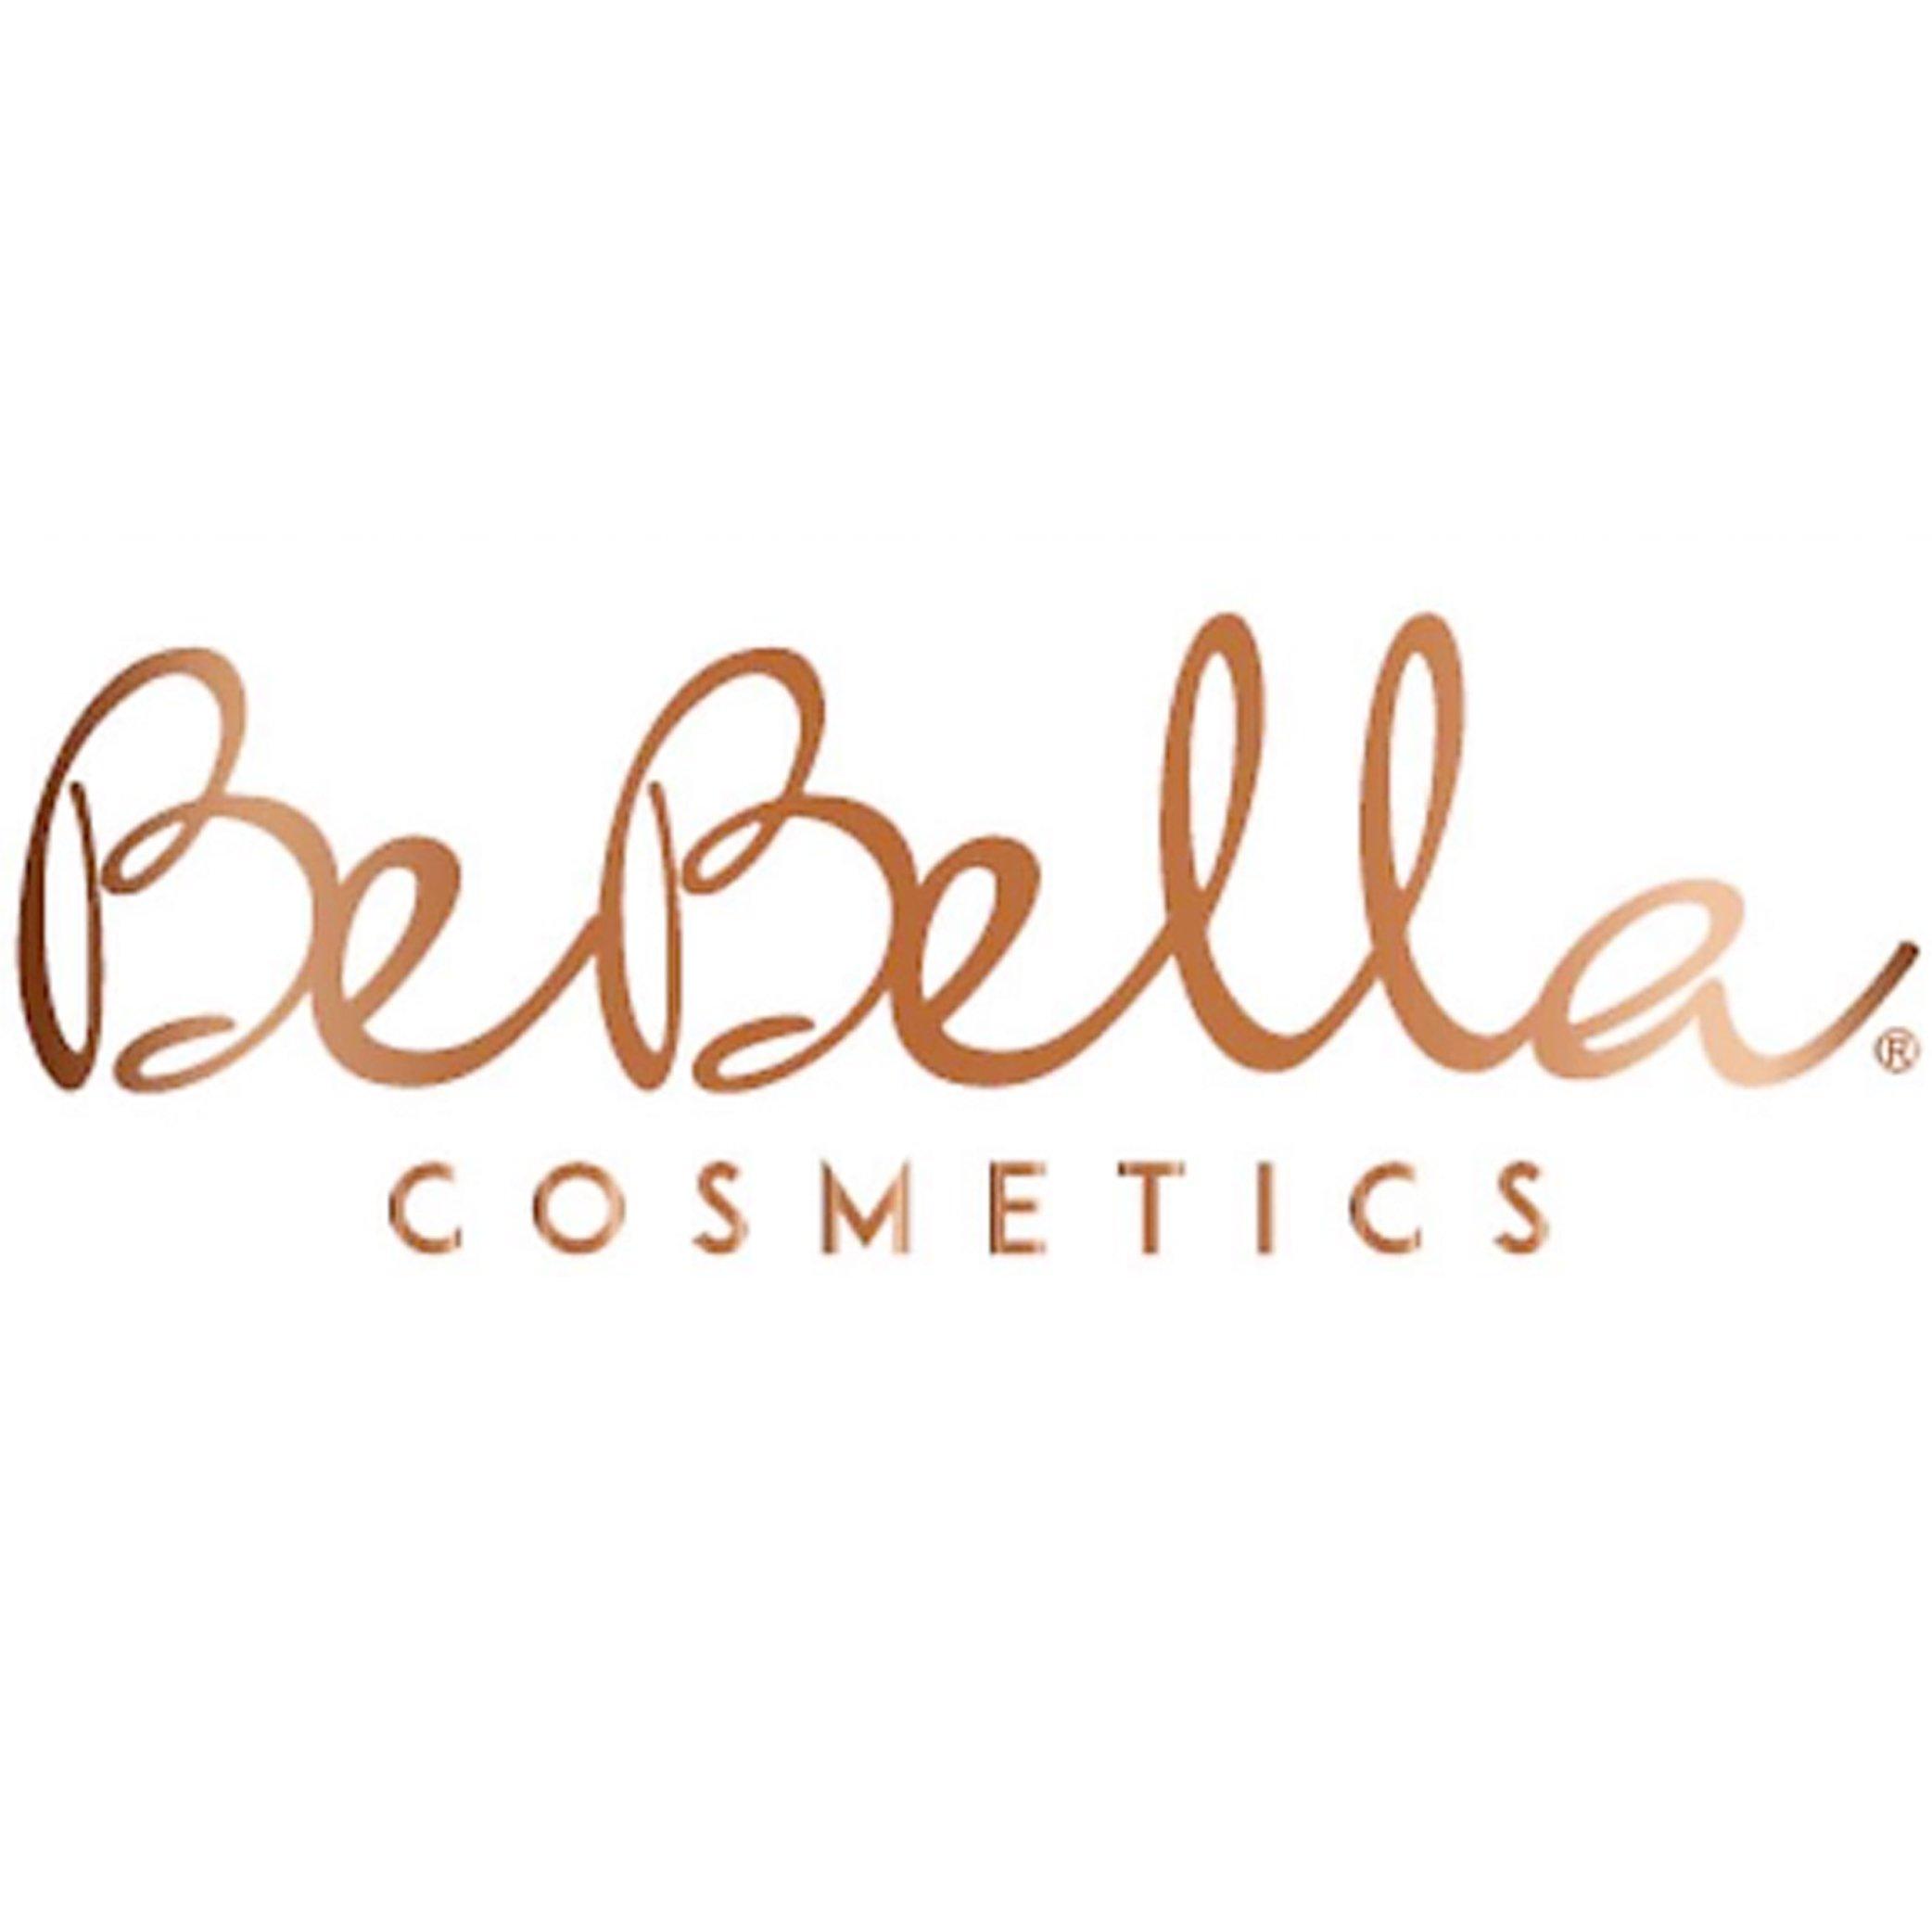 BeBella Cosmetics' logo